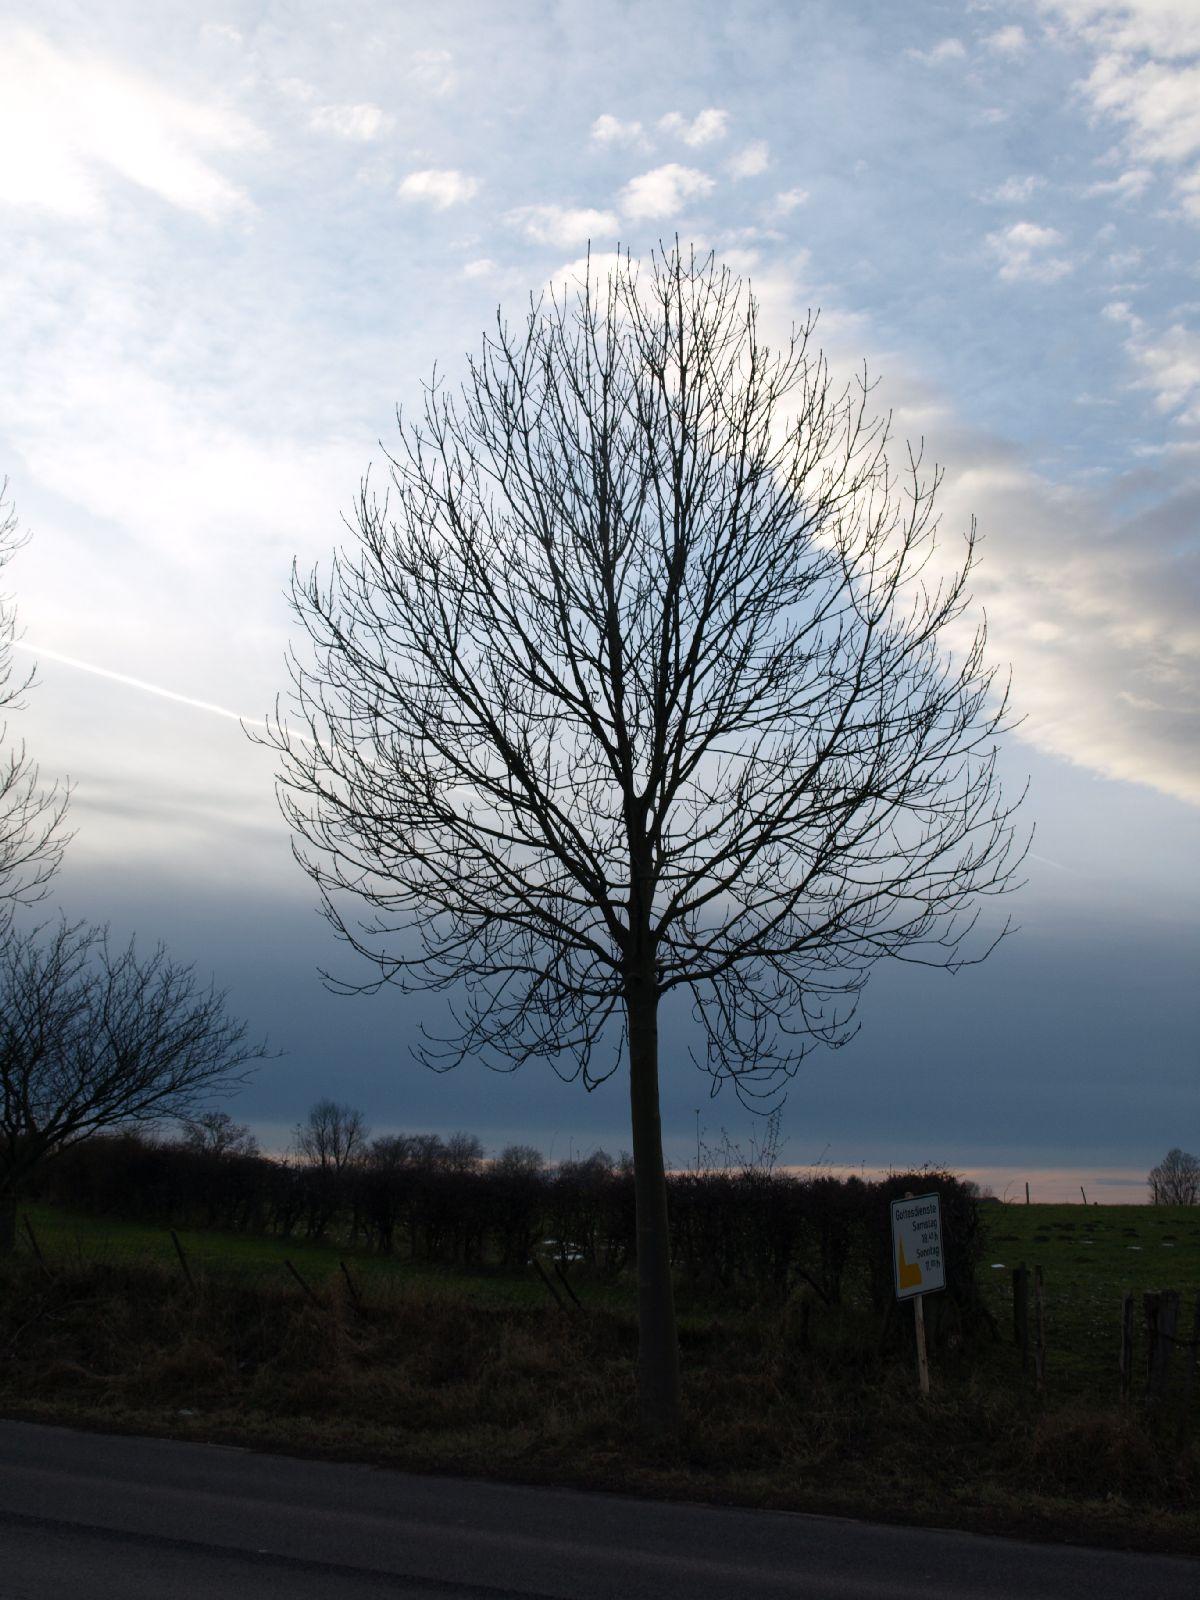 Pflanzen-Baum-Silhouette-Foto_Textur_B_PC147676